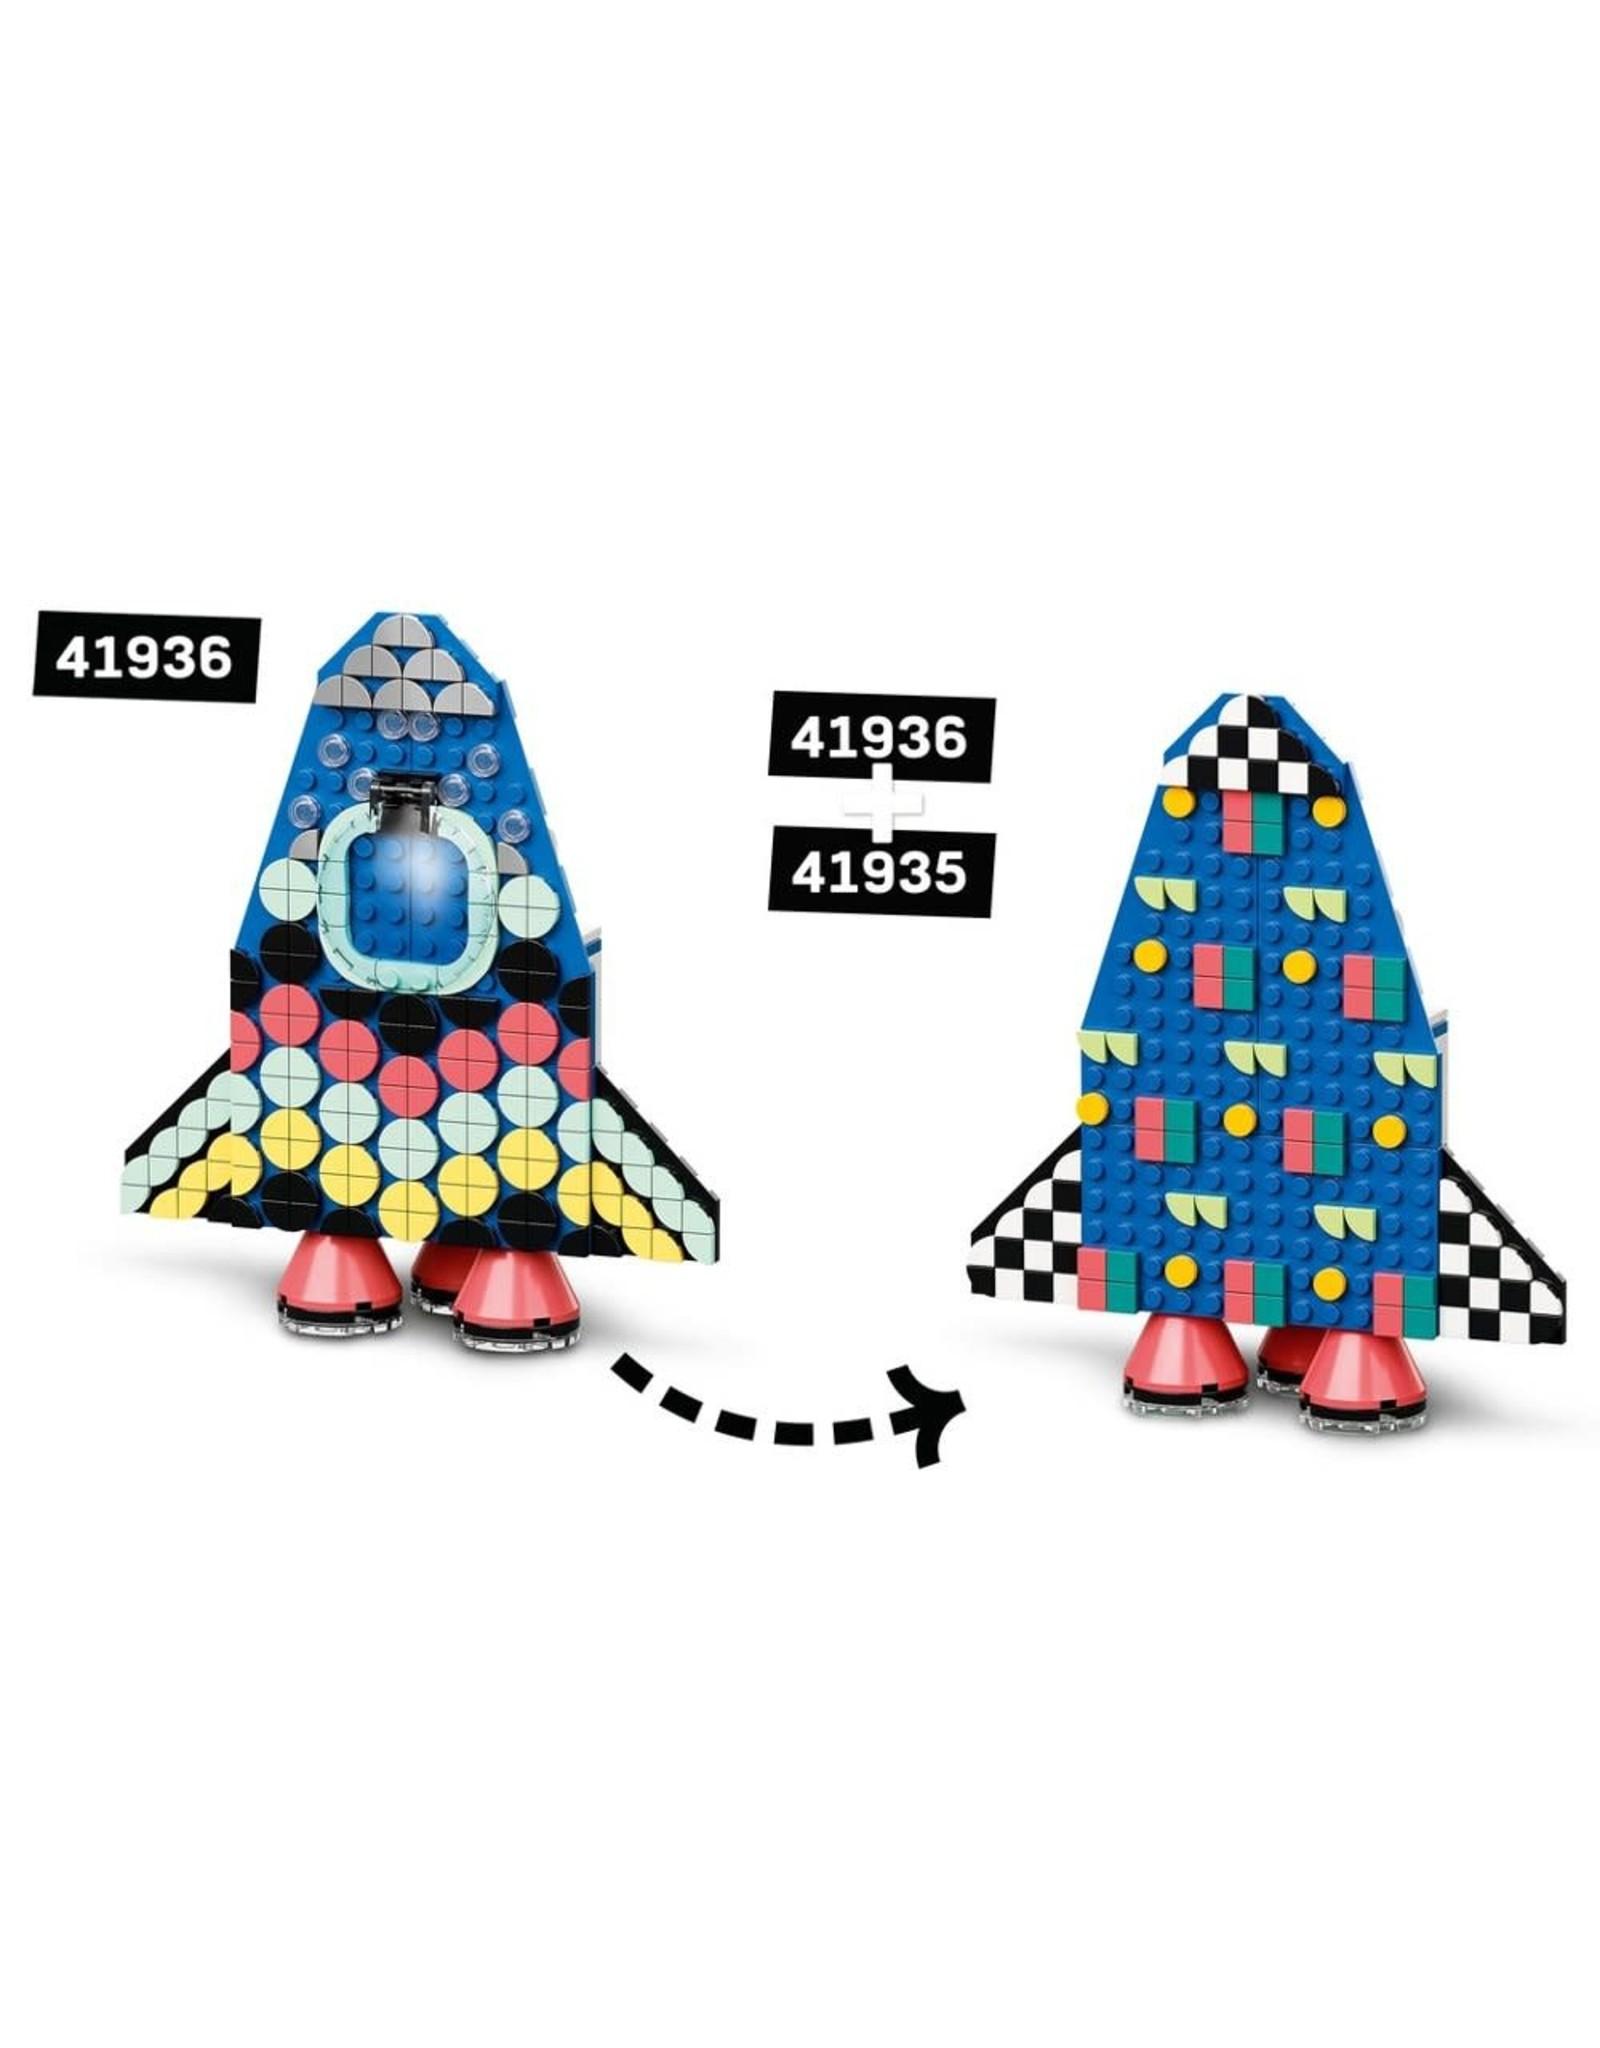 LEGO Dots - 41935 Lots of Dots